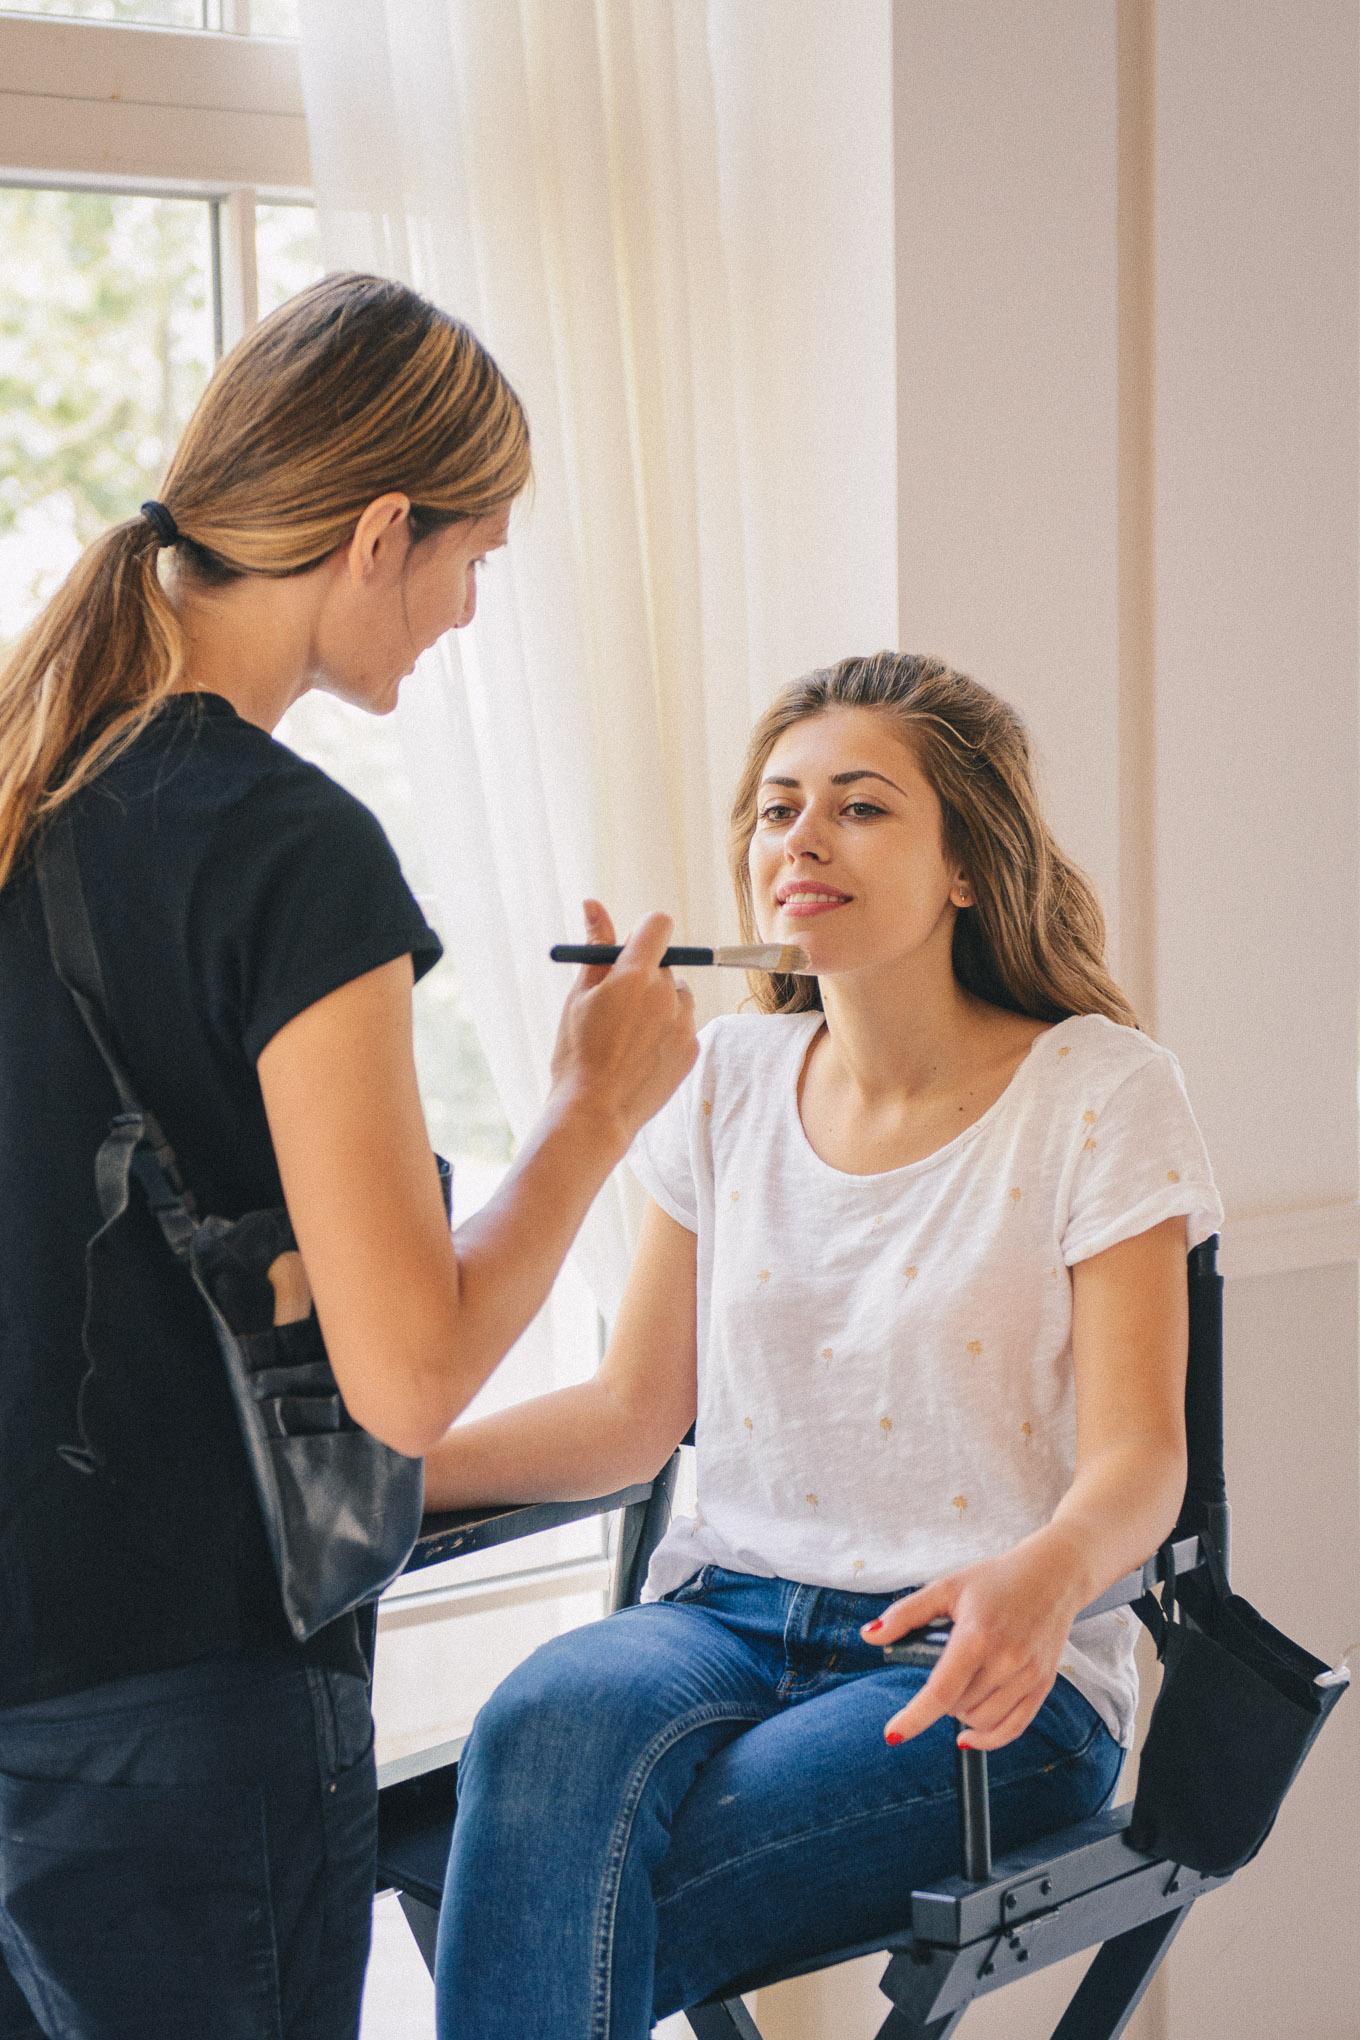 The Make up artist